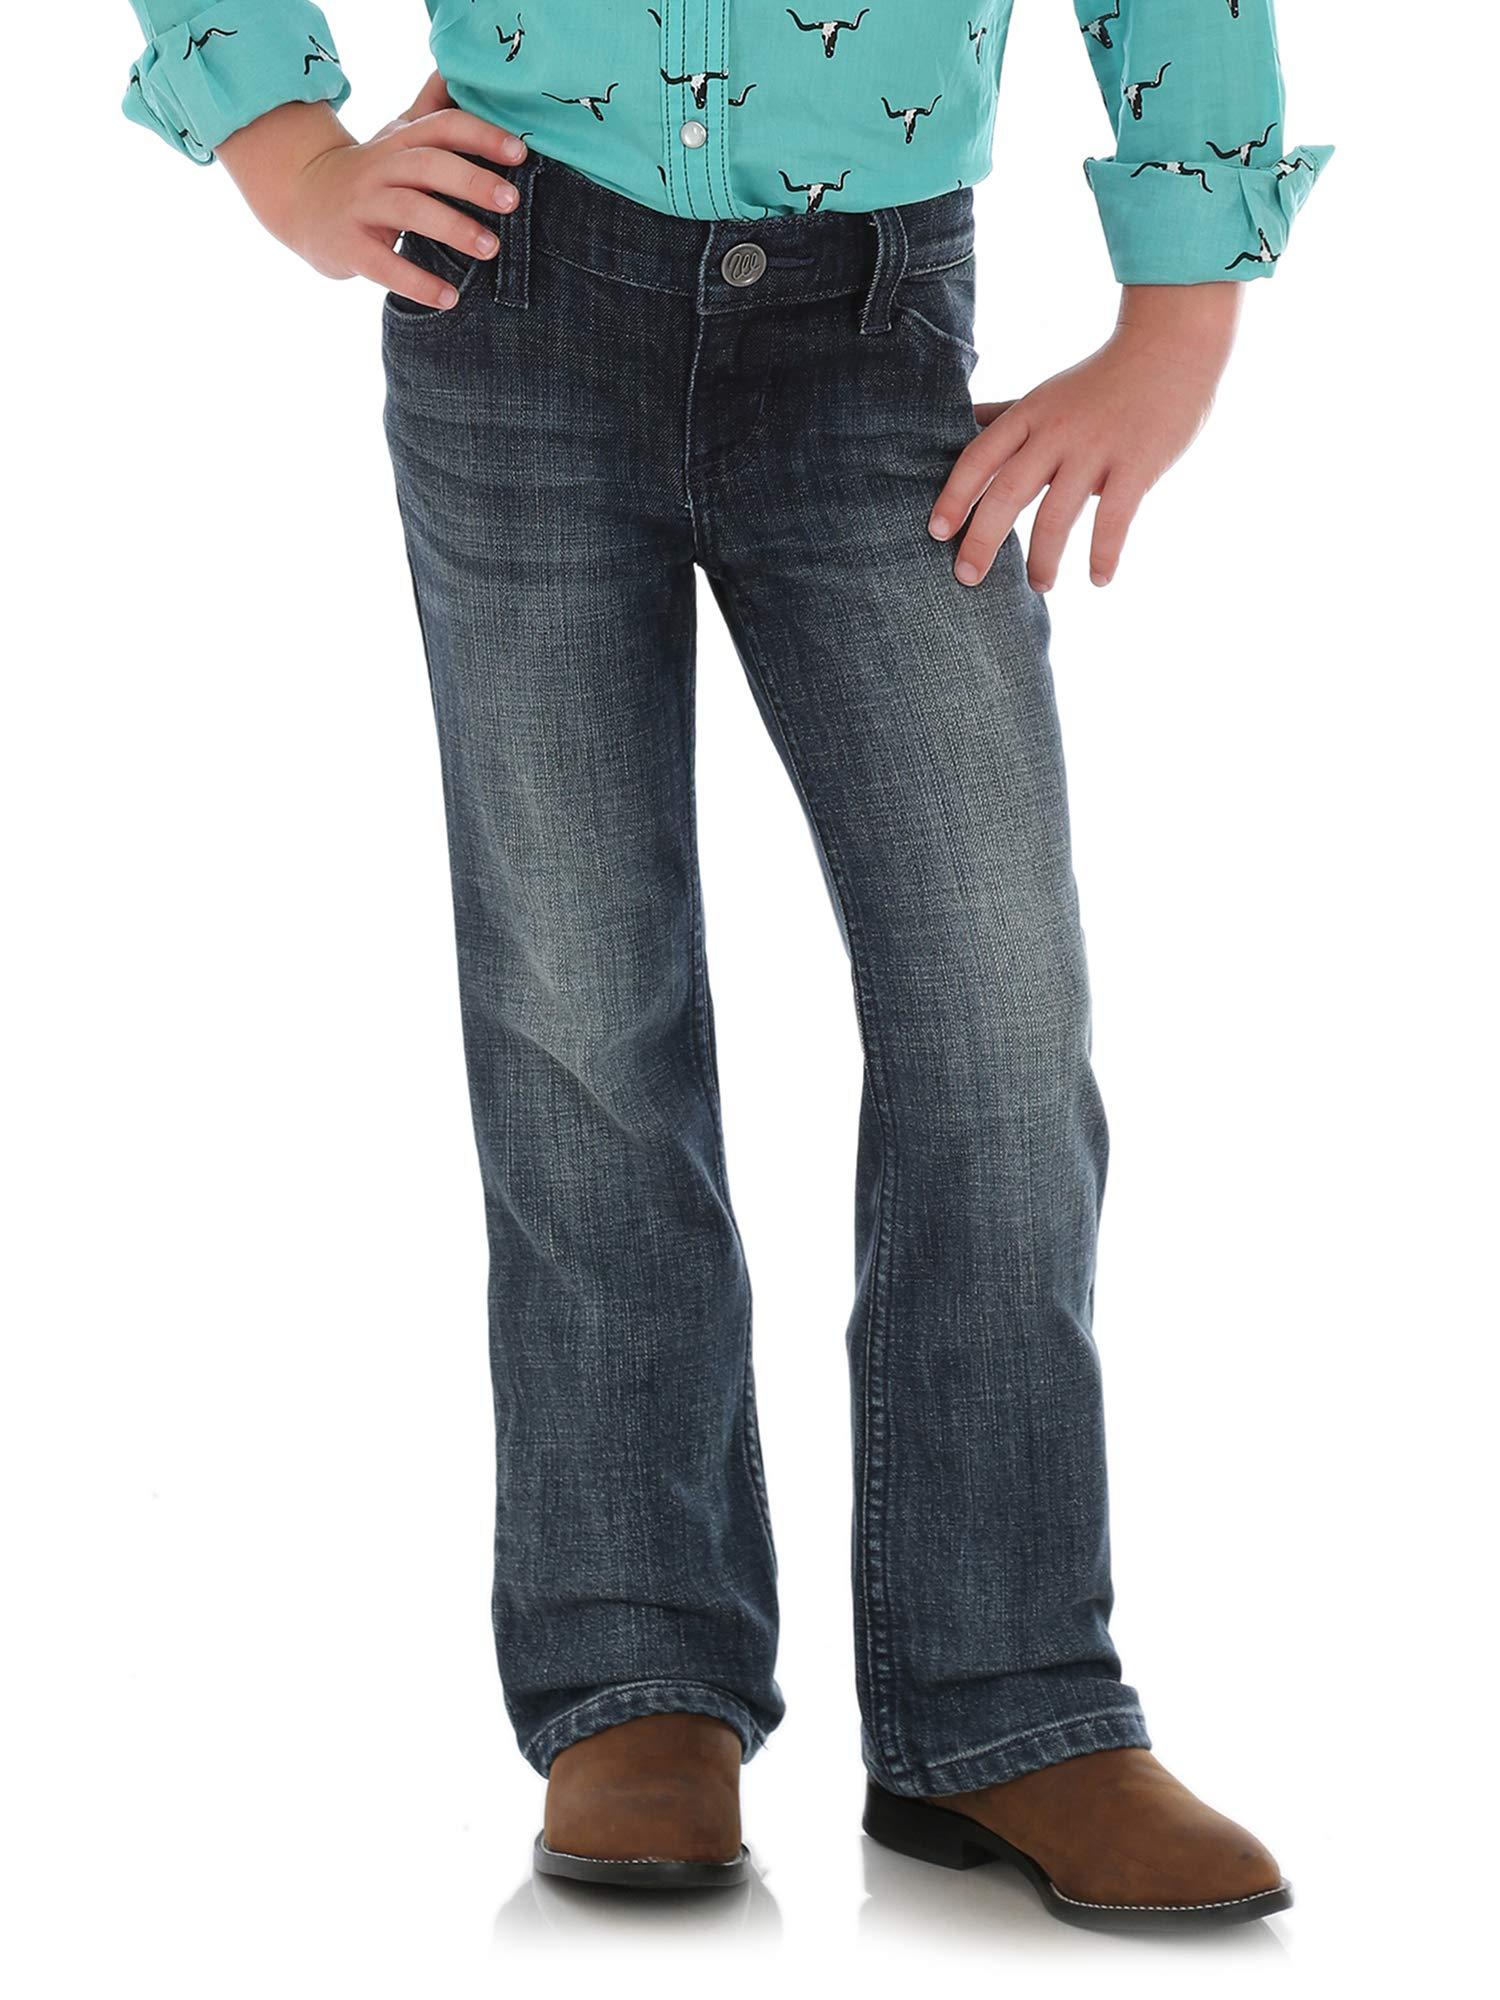 Wrangler Girls' Big Western Boot Cut Jean, Mid Blue, 14 REG by Wrangler